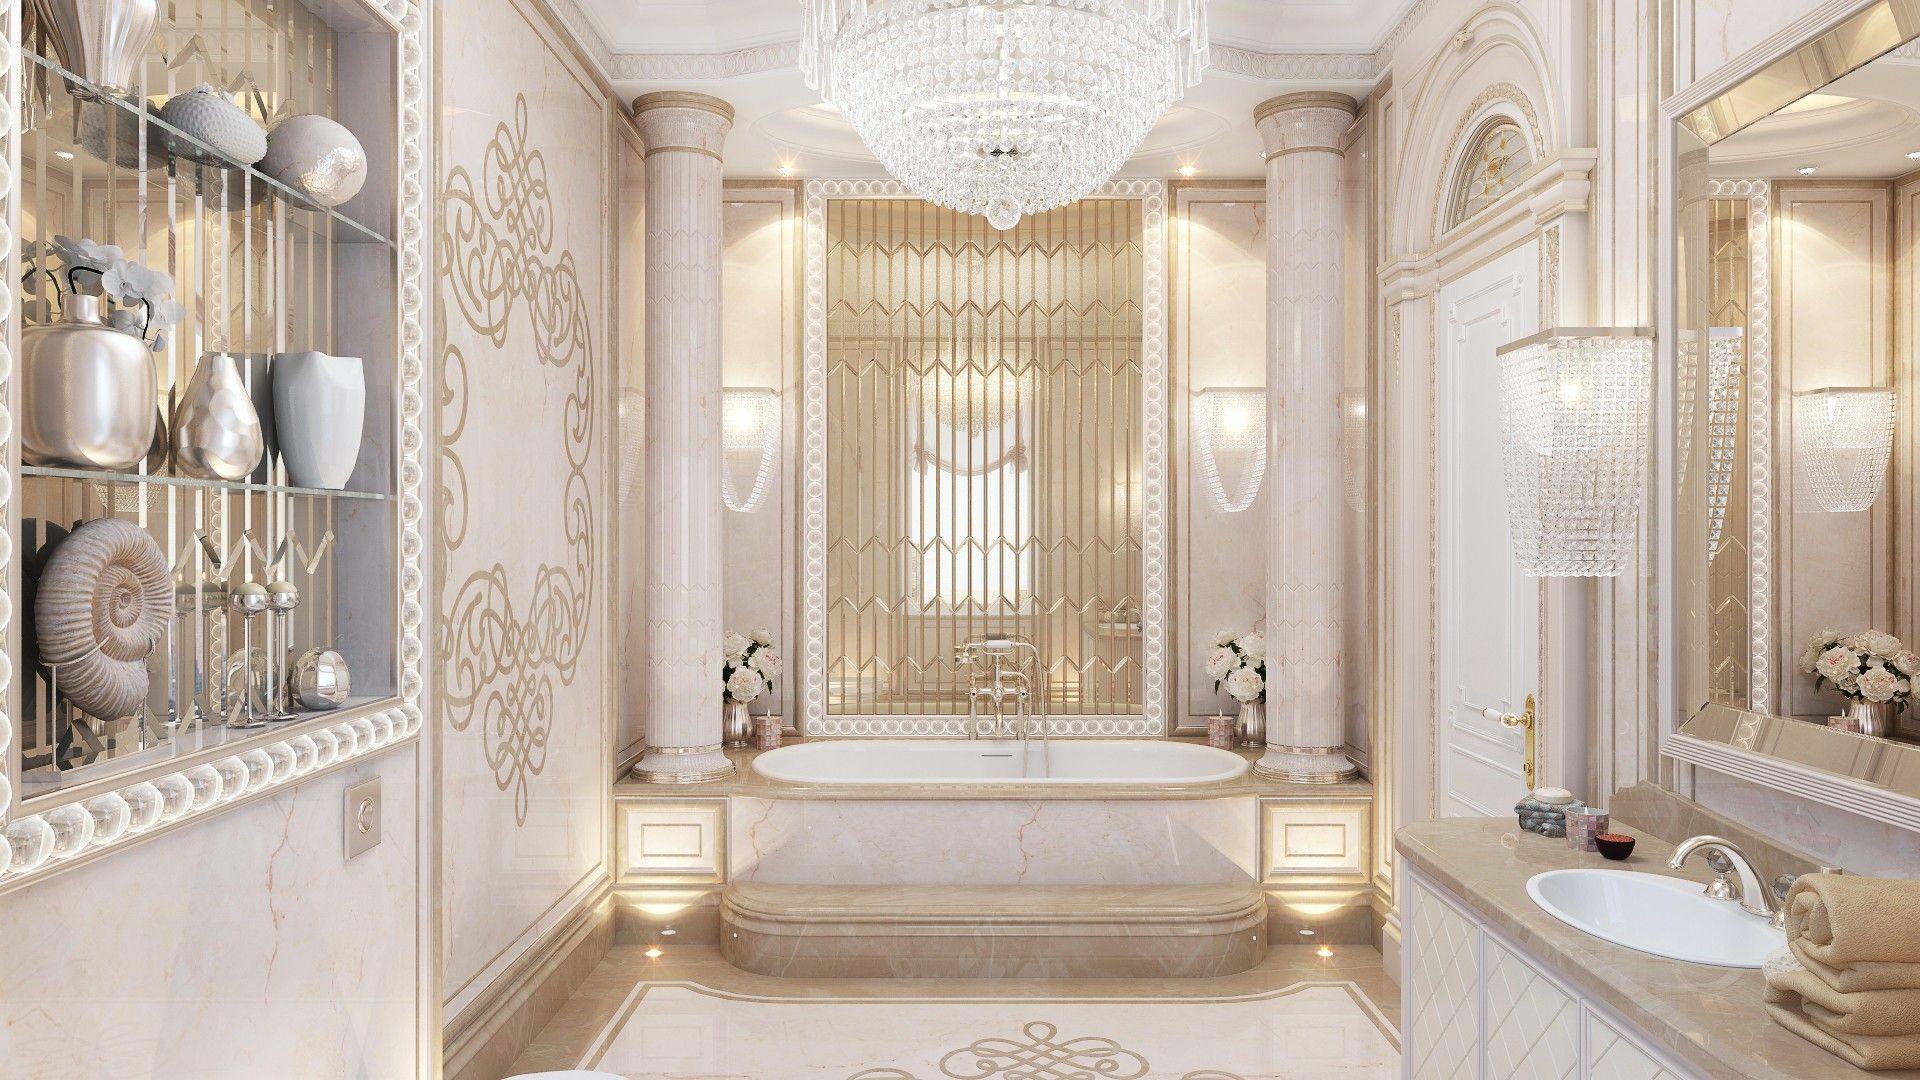 Bathroom interior hd beautiful bathroom design  bathroom  pinterest  bathroom designs